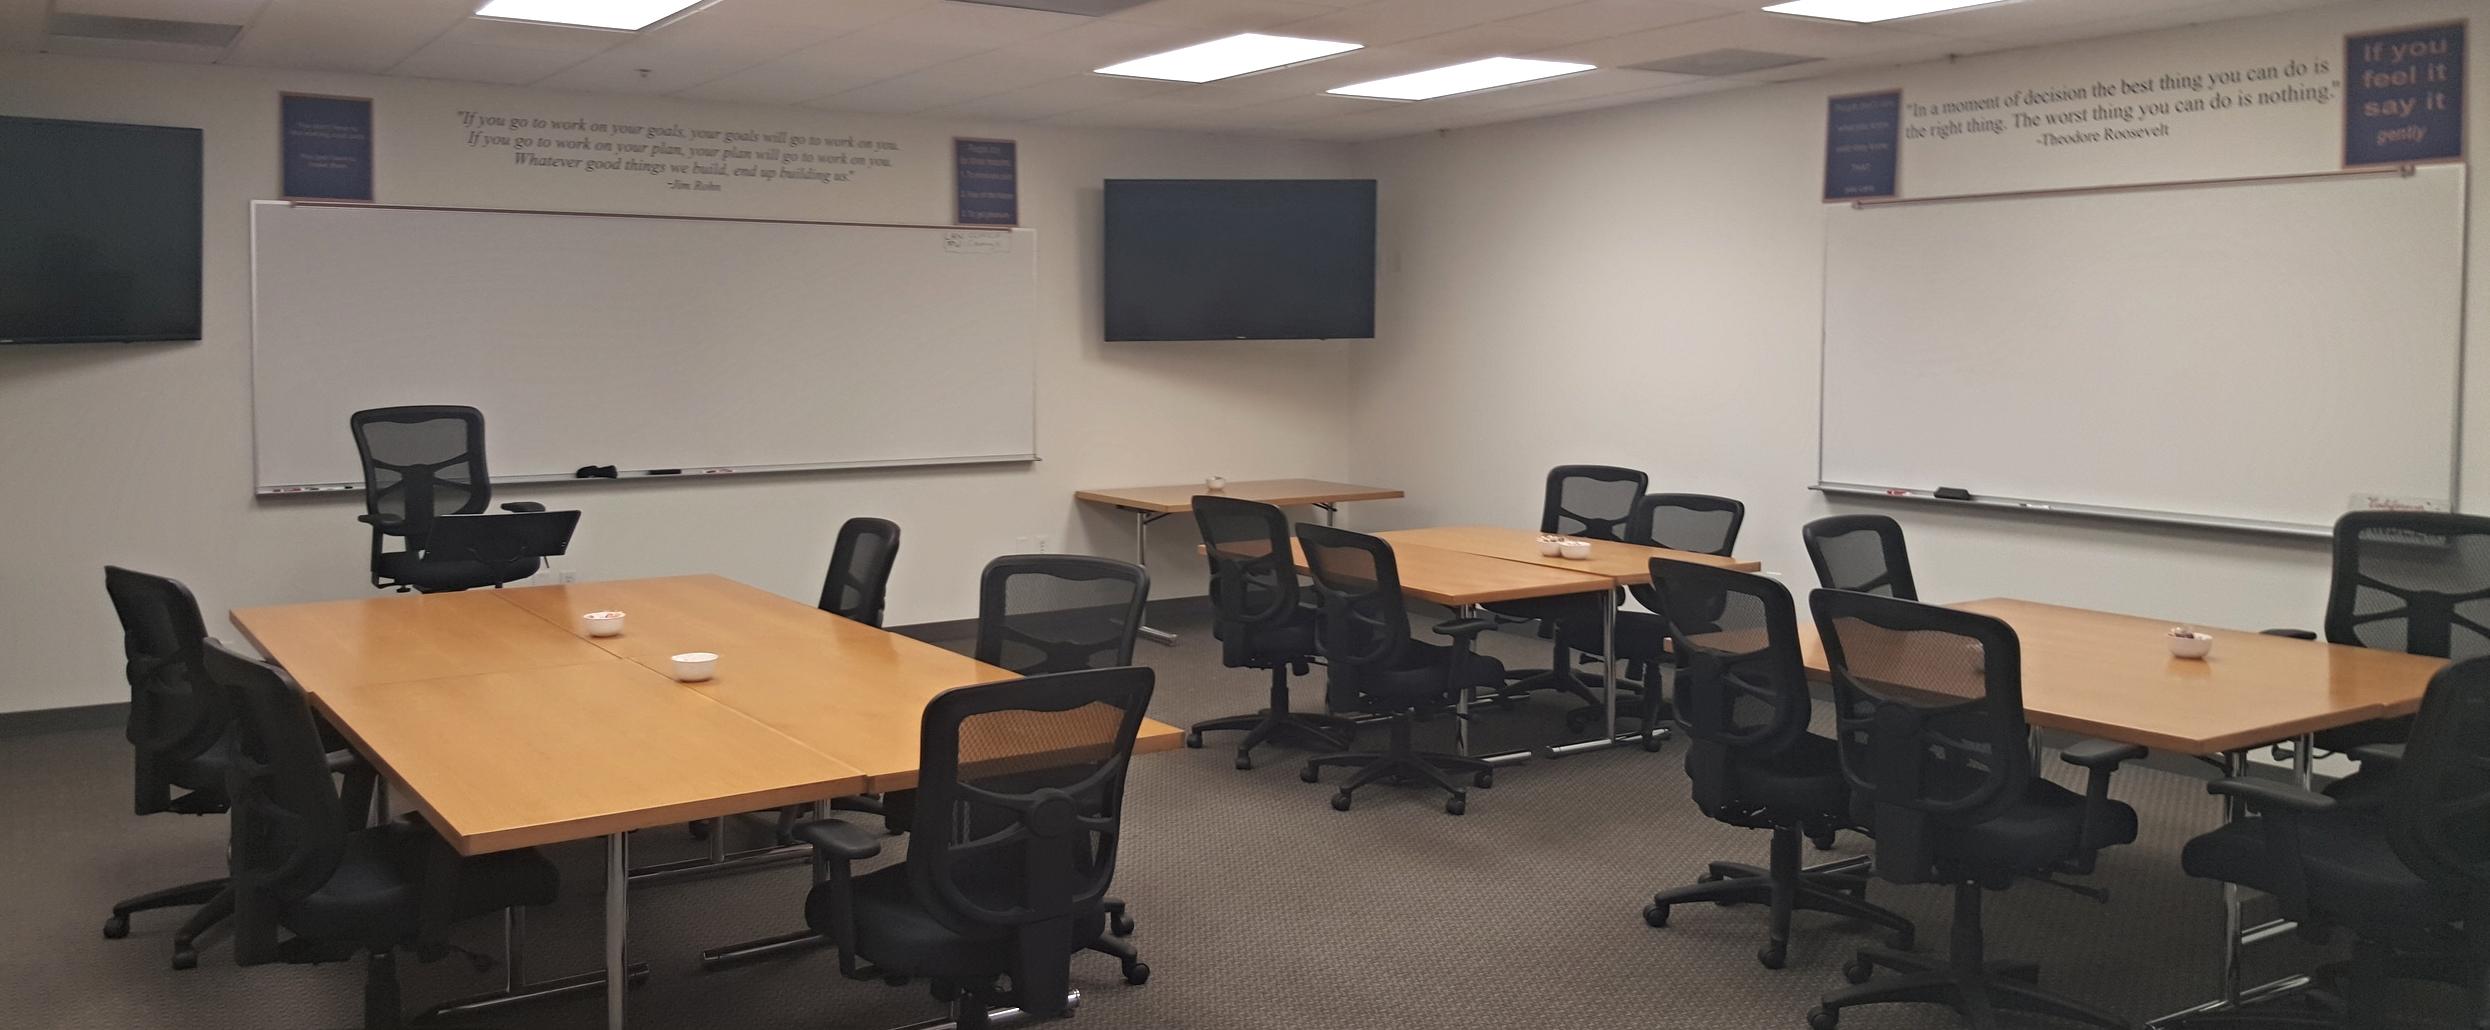 Training Center in Orange County